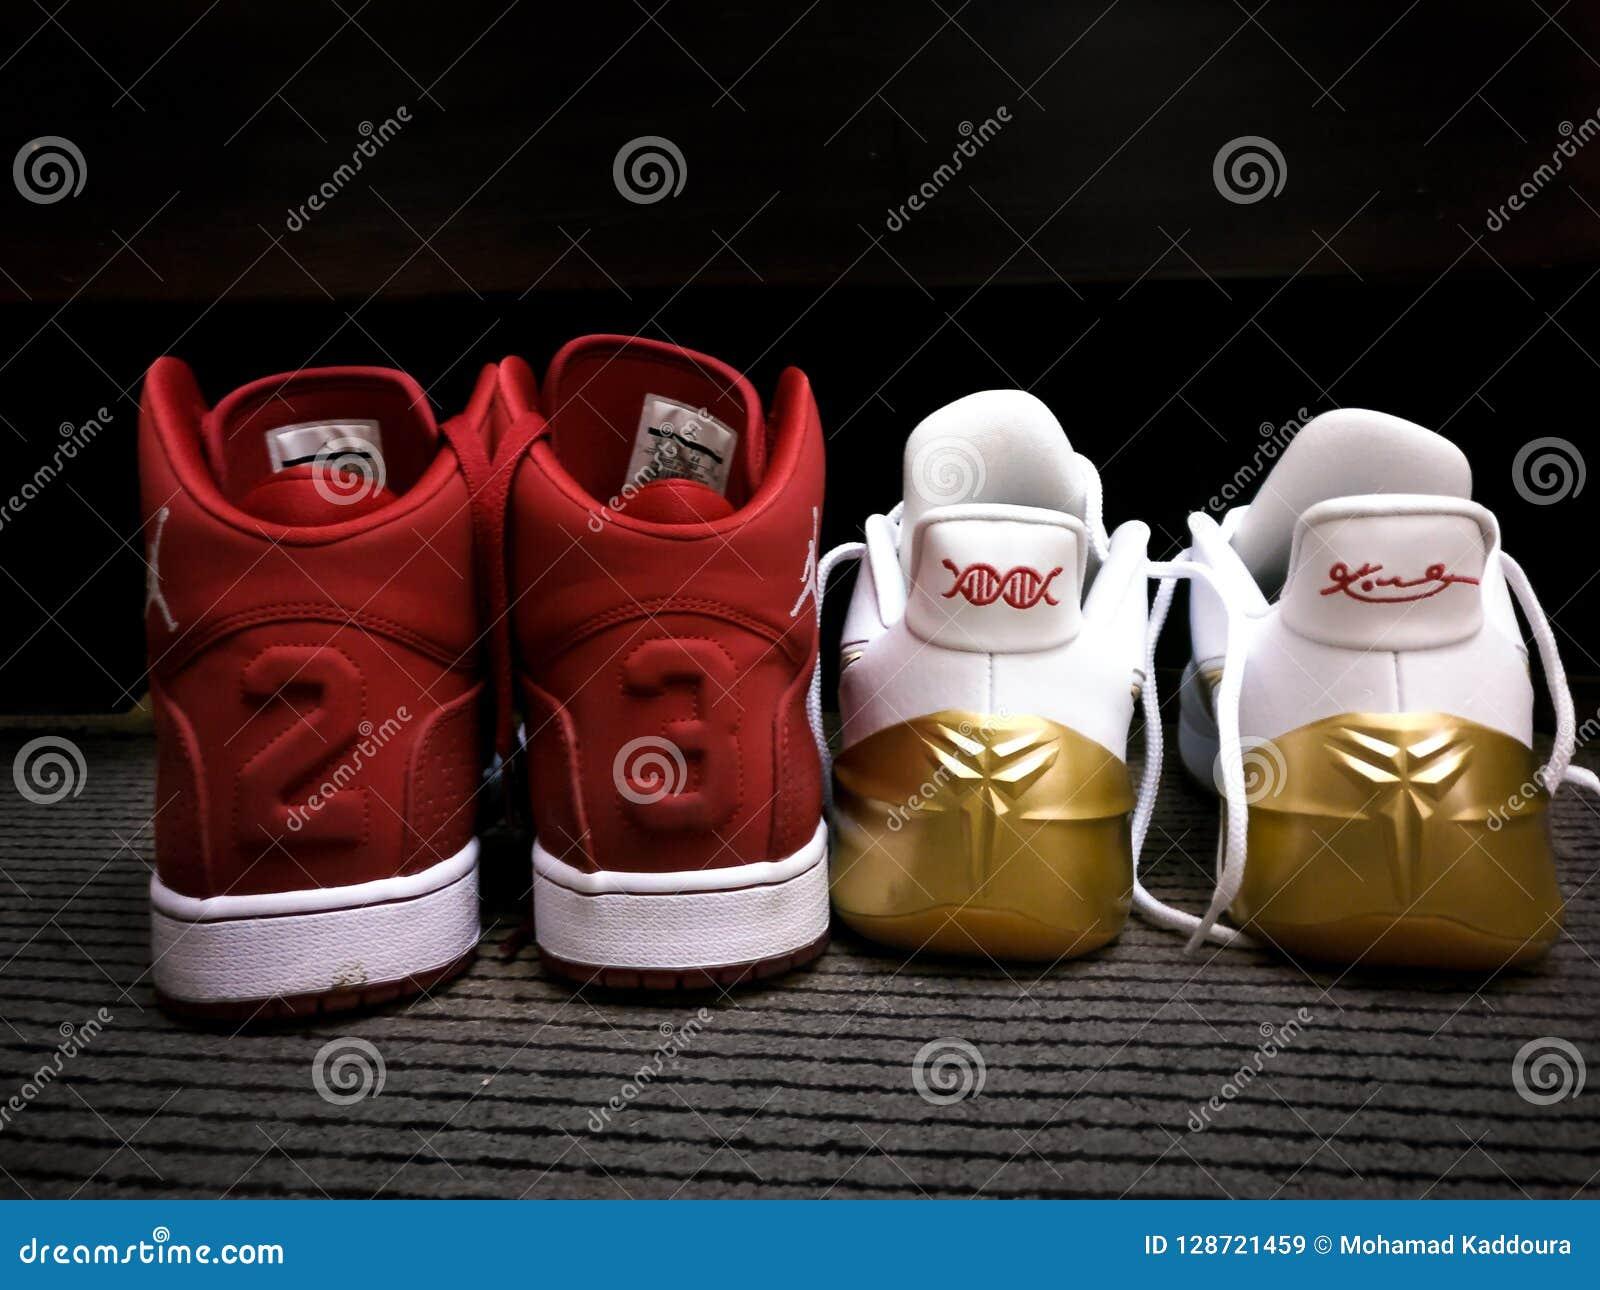 sale retailer 87aad 4d8de Red and white Nike Michael Jordan 23 sneakers - Kobe Bryant nike sneakers  Black Mamba.